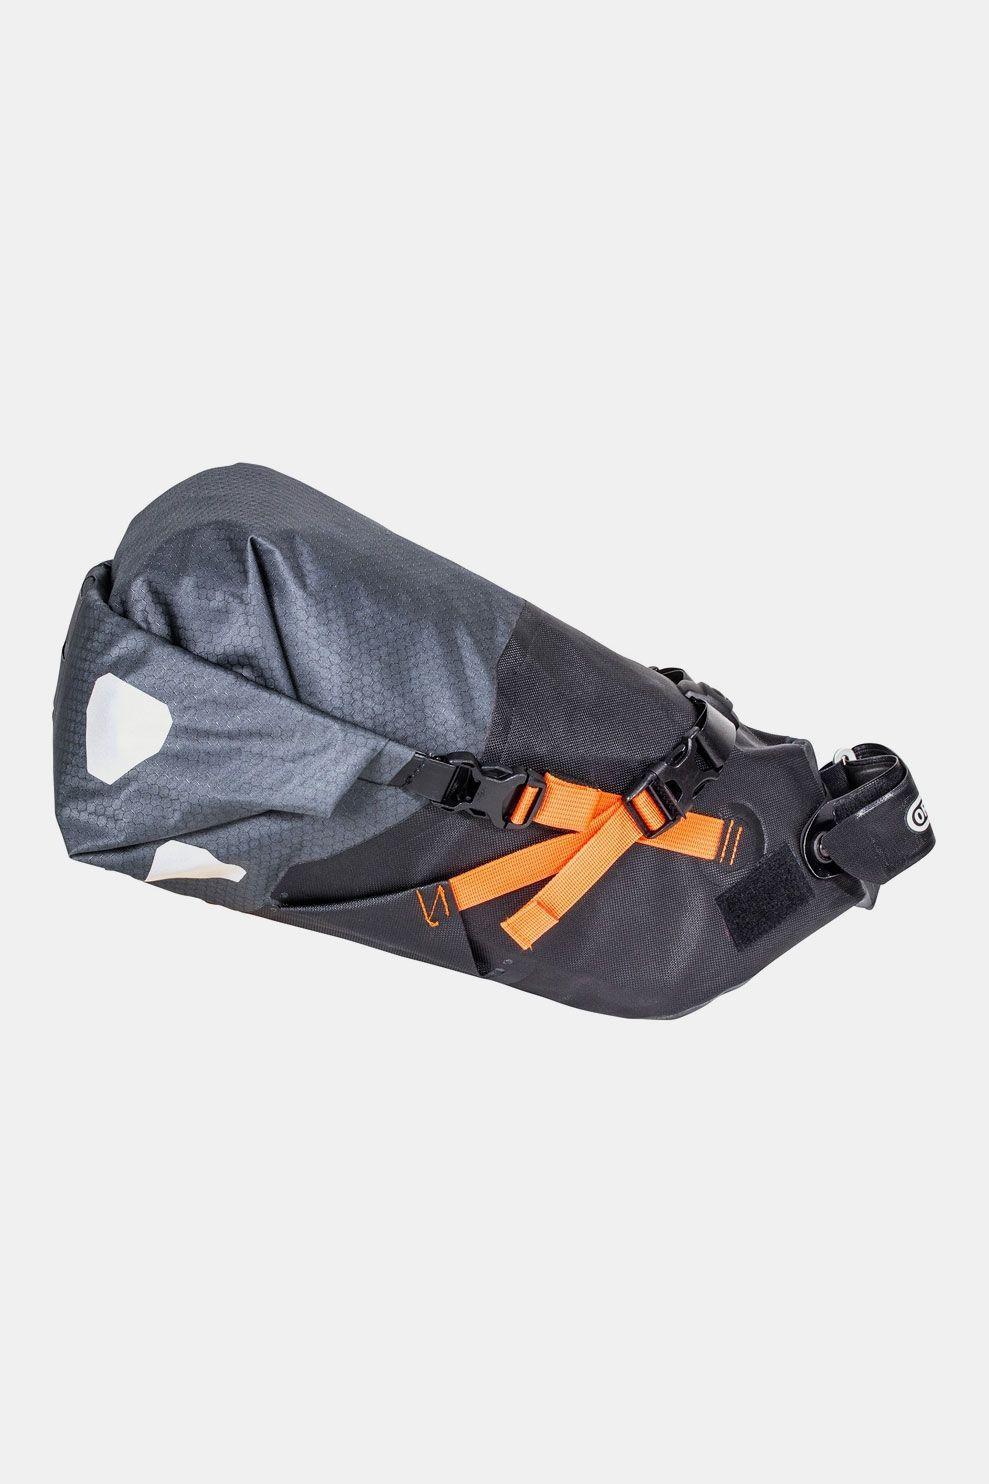 Ortlieb Seat-Pack M 11l Zadeltas Donkergrijs/Oranje